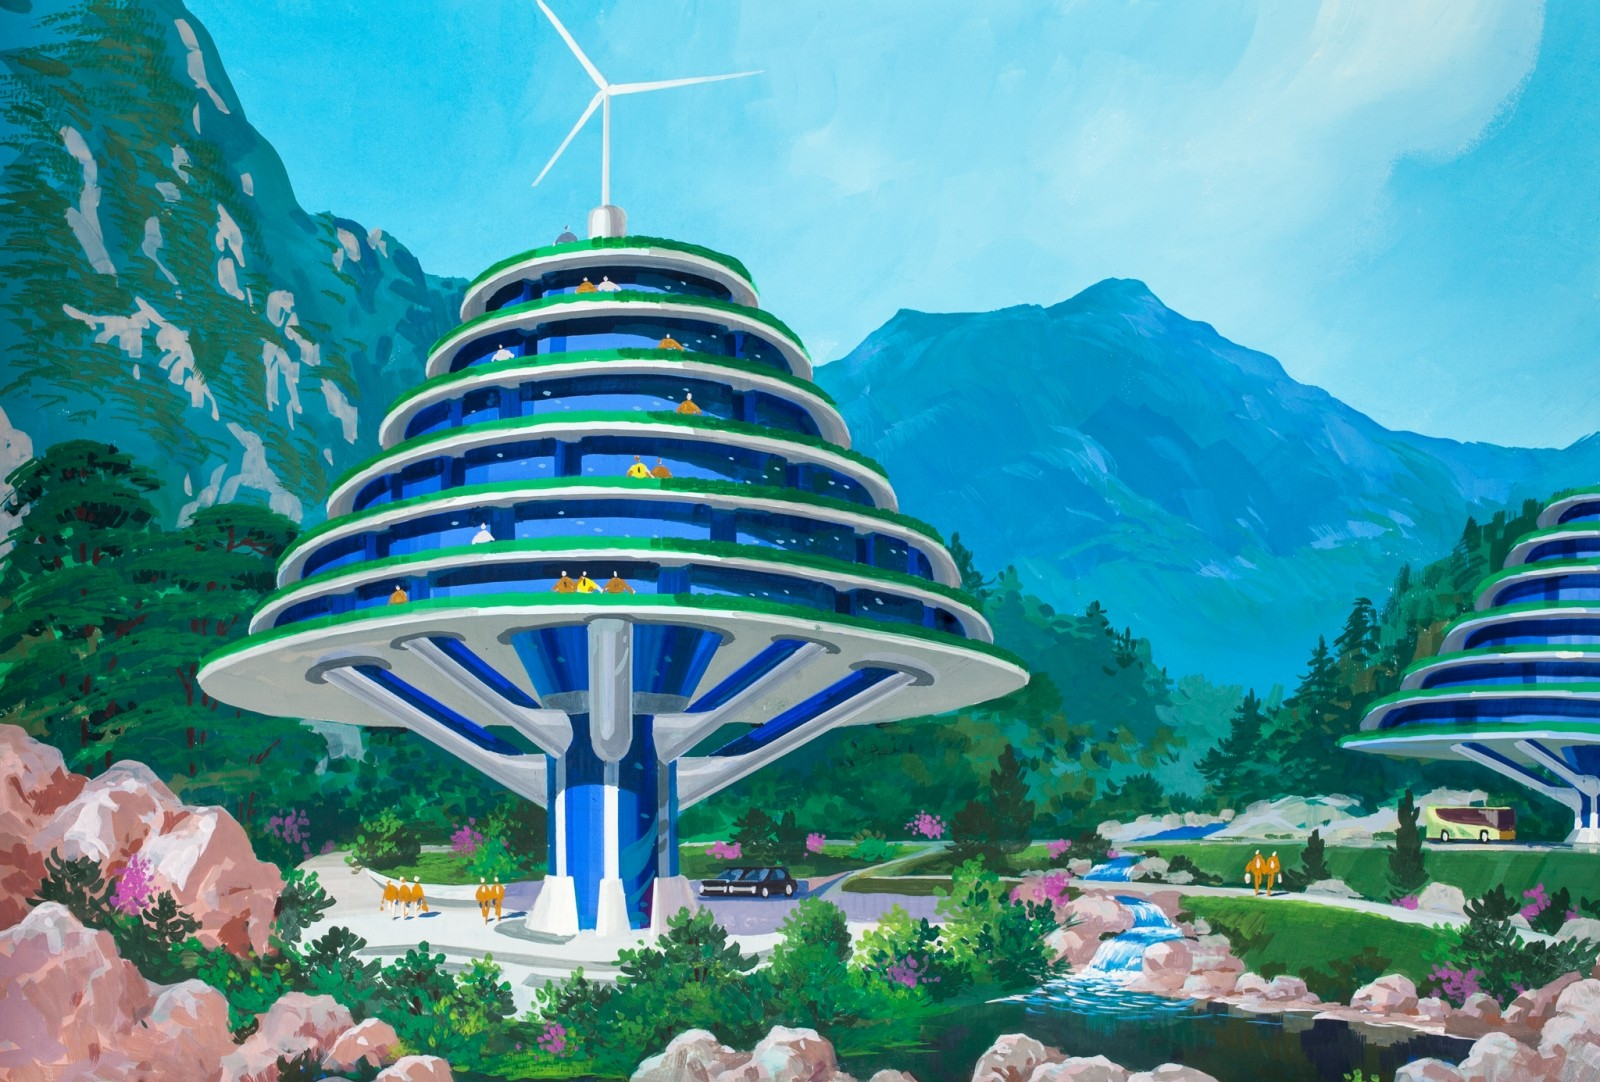 Un resort en Monte Kumgang. Imagen cortesía de Koryo Tours